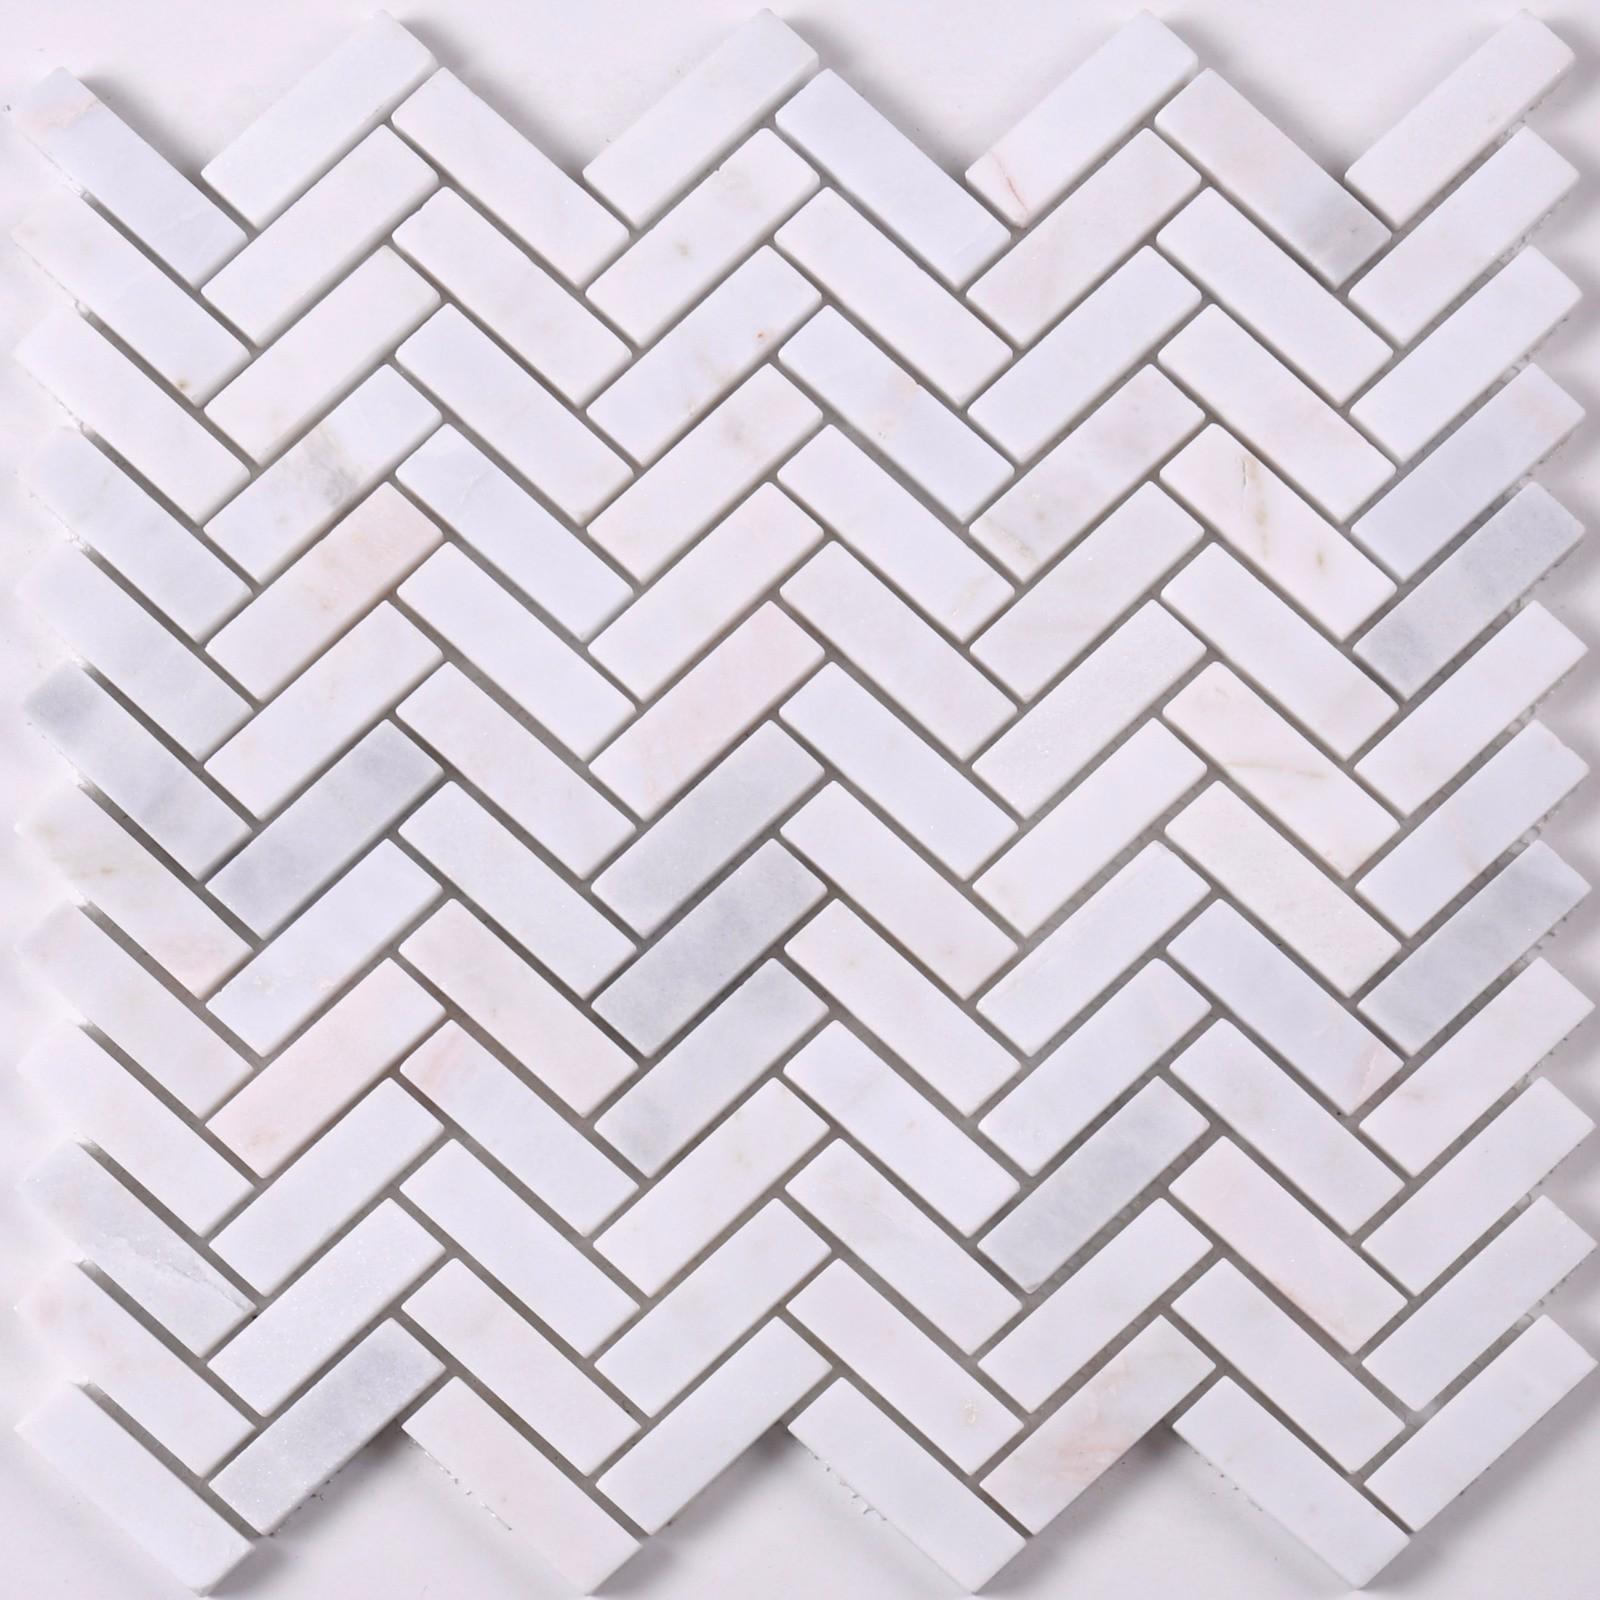 Heng Xing-Custom Stone Tile Manufacturer, Hexagon Carrara Tile | Stone Mosaic Tile